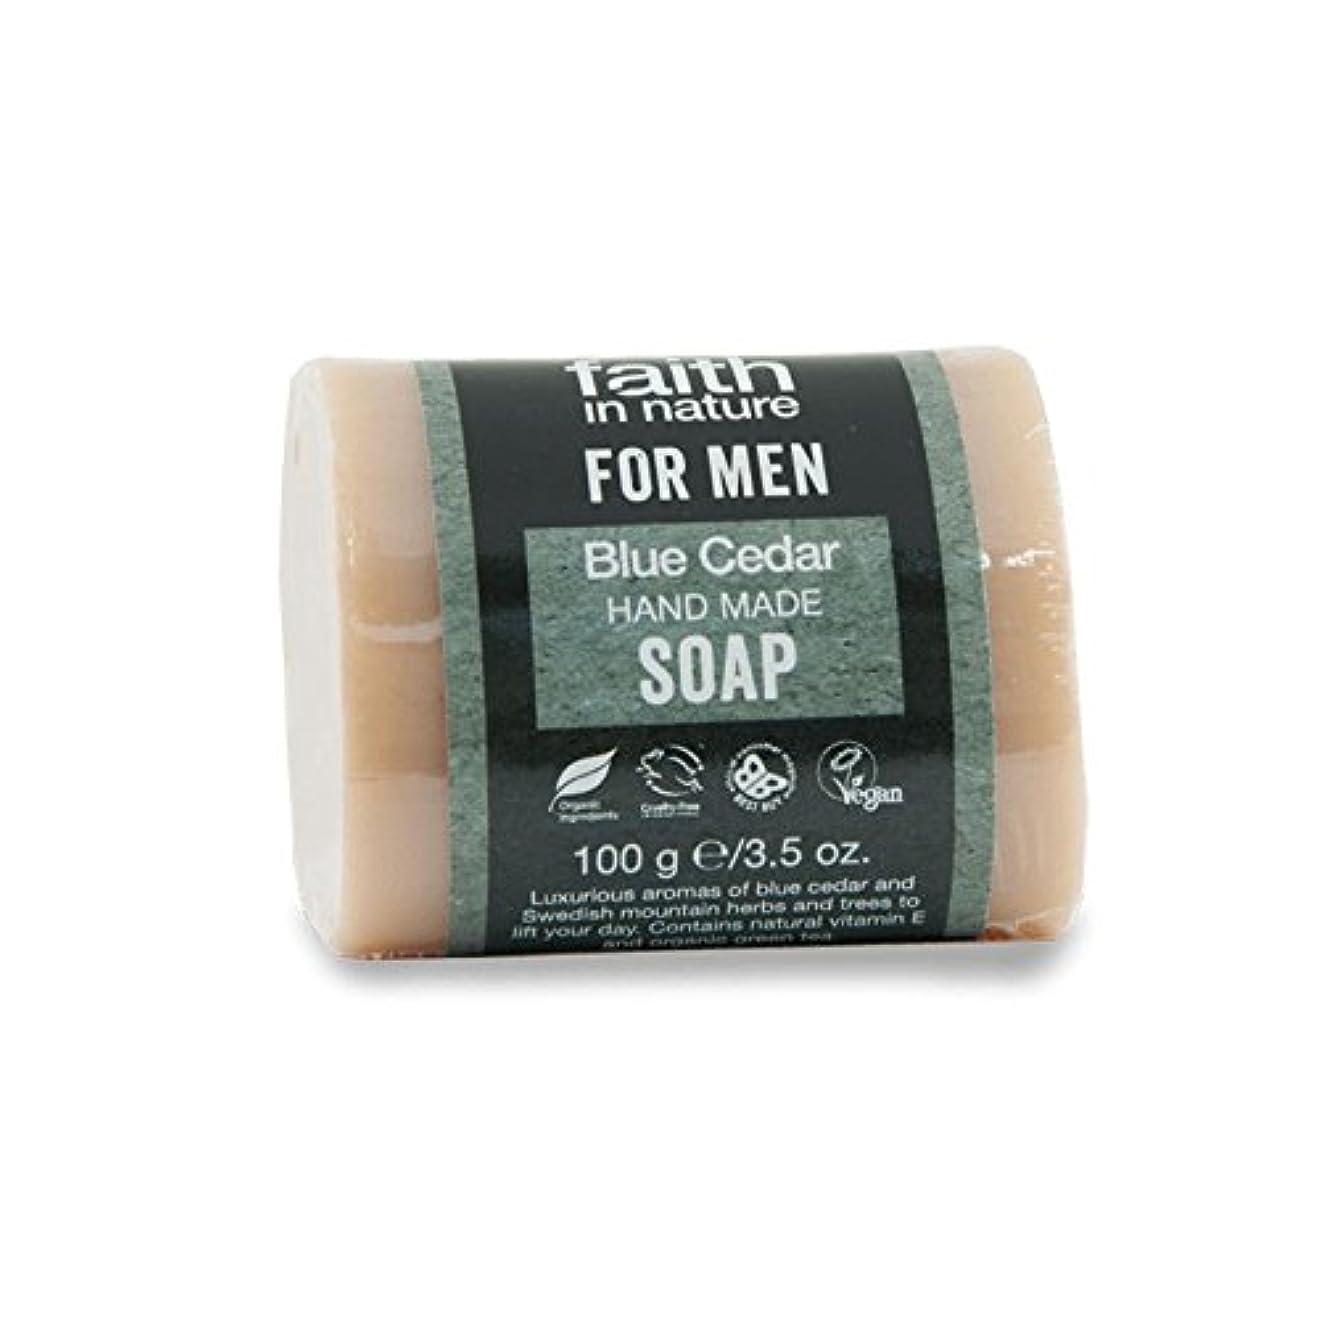 Faith in Nature for Men Blue Cedar Soap 100g (Pack of 2) - 男性青杉の石鹸100グラムのための自然の中で信仰 (x2) [並行輸入品]